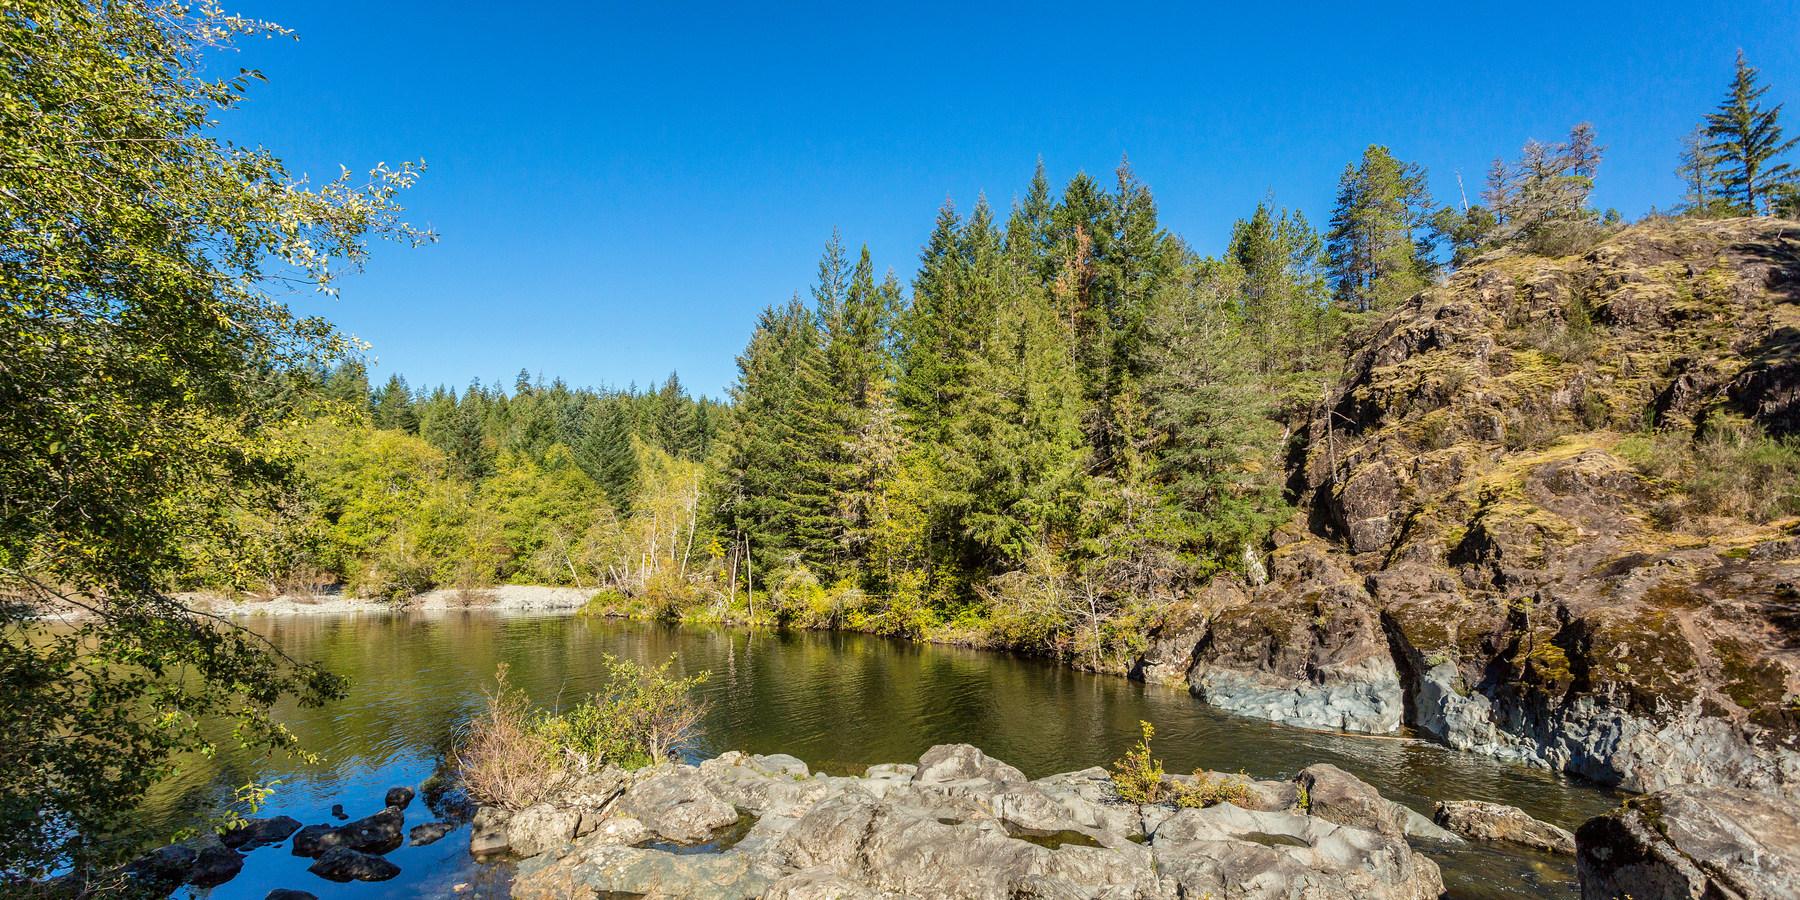 spring salmon place campground sooke potholes regional. Black Bedroom Furniture Sets. Home Design Ideas